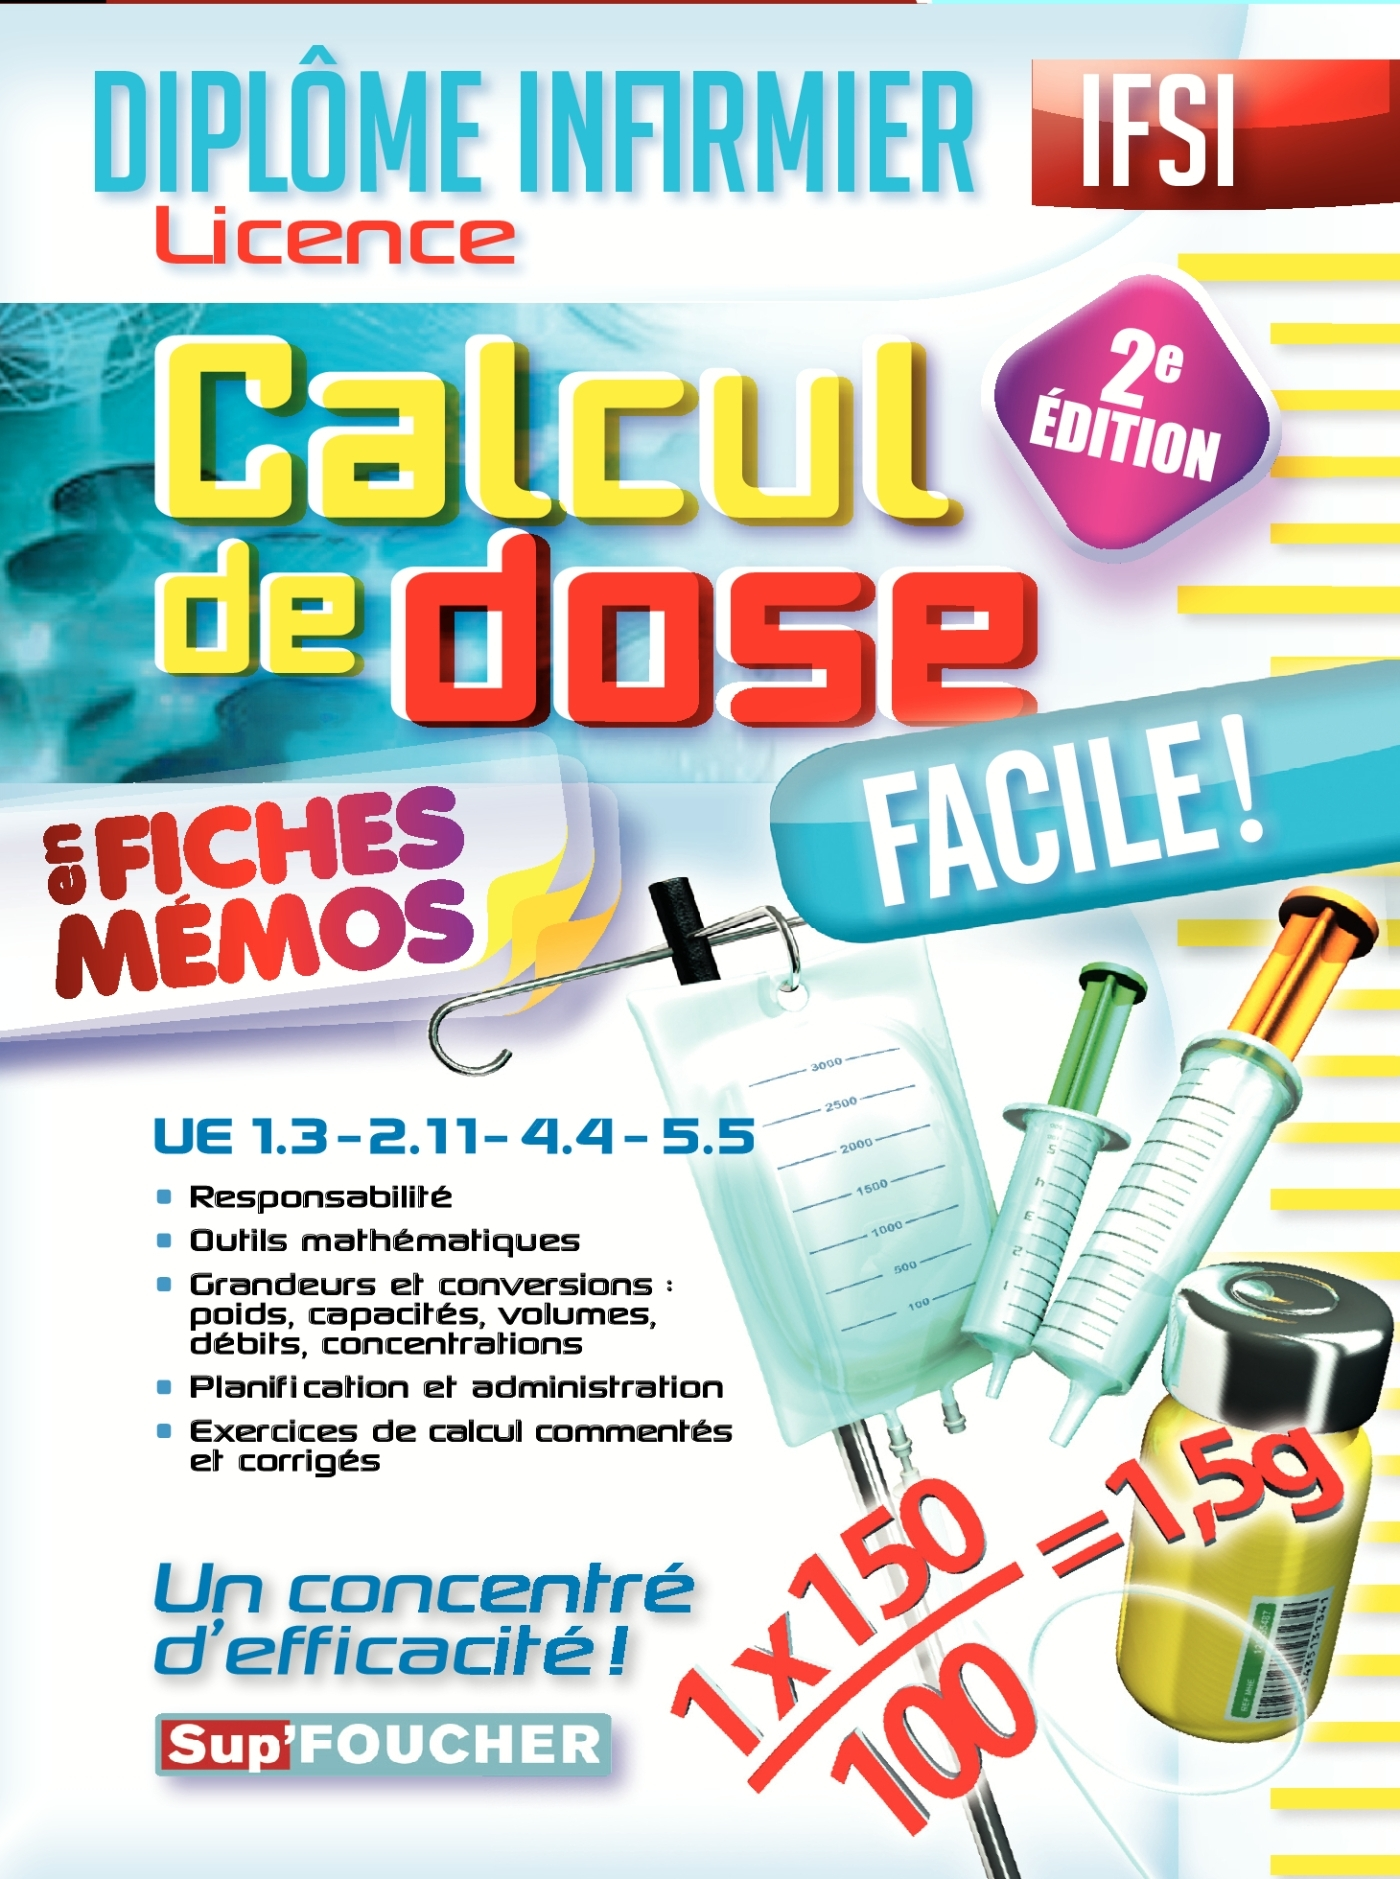 CALCUL DE DOSE FACILE - DIPLOME D'ETAT INFIRMIER - IFSI - 2E EDITION